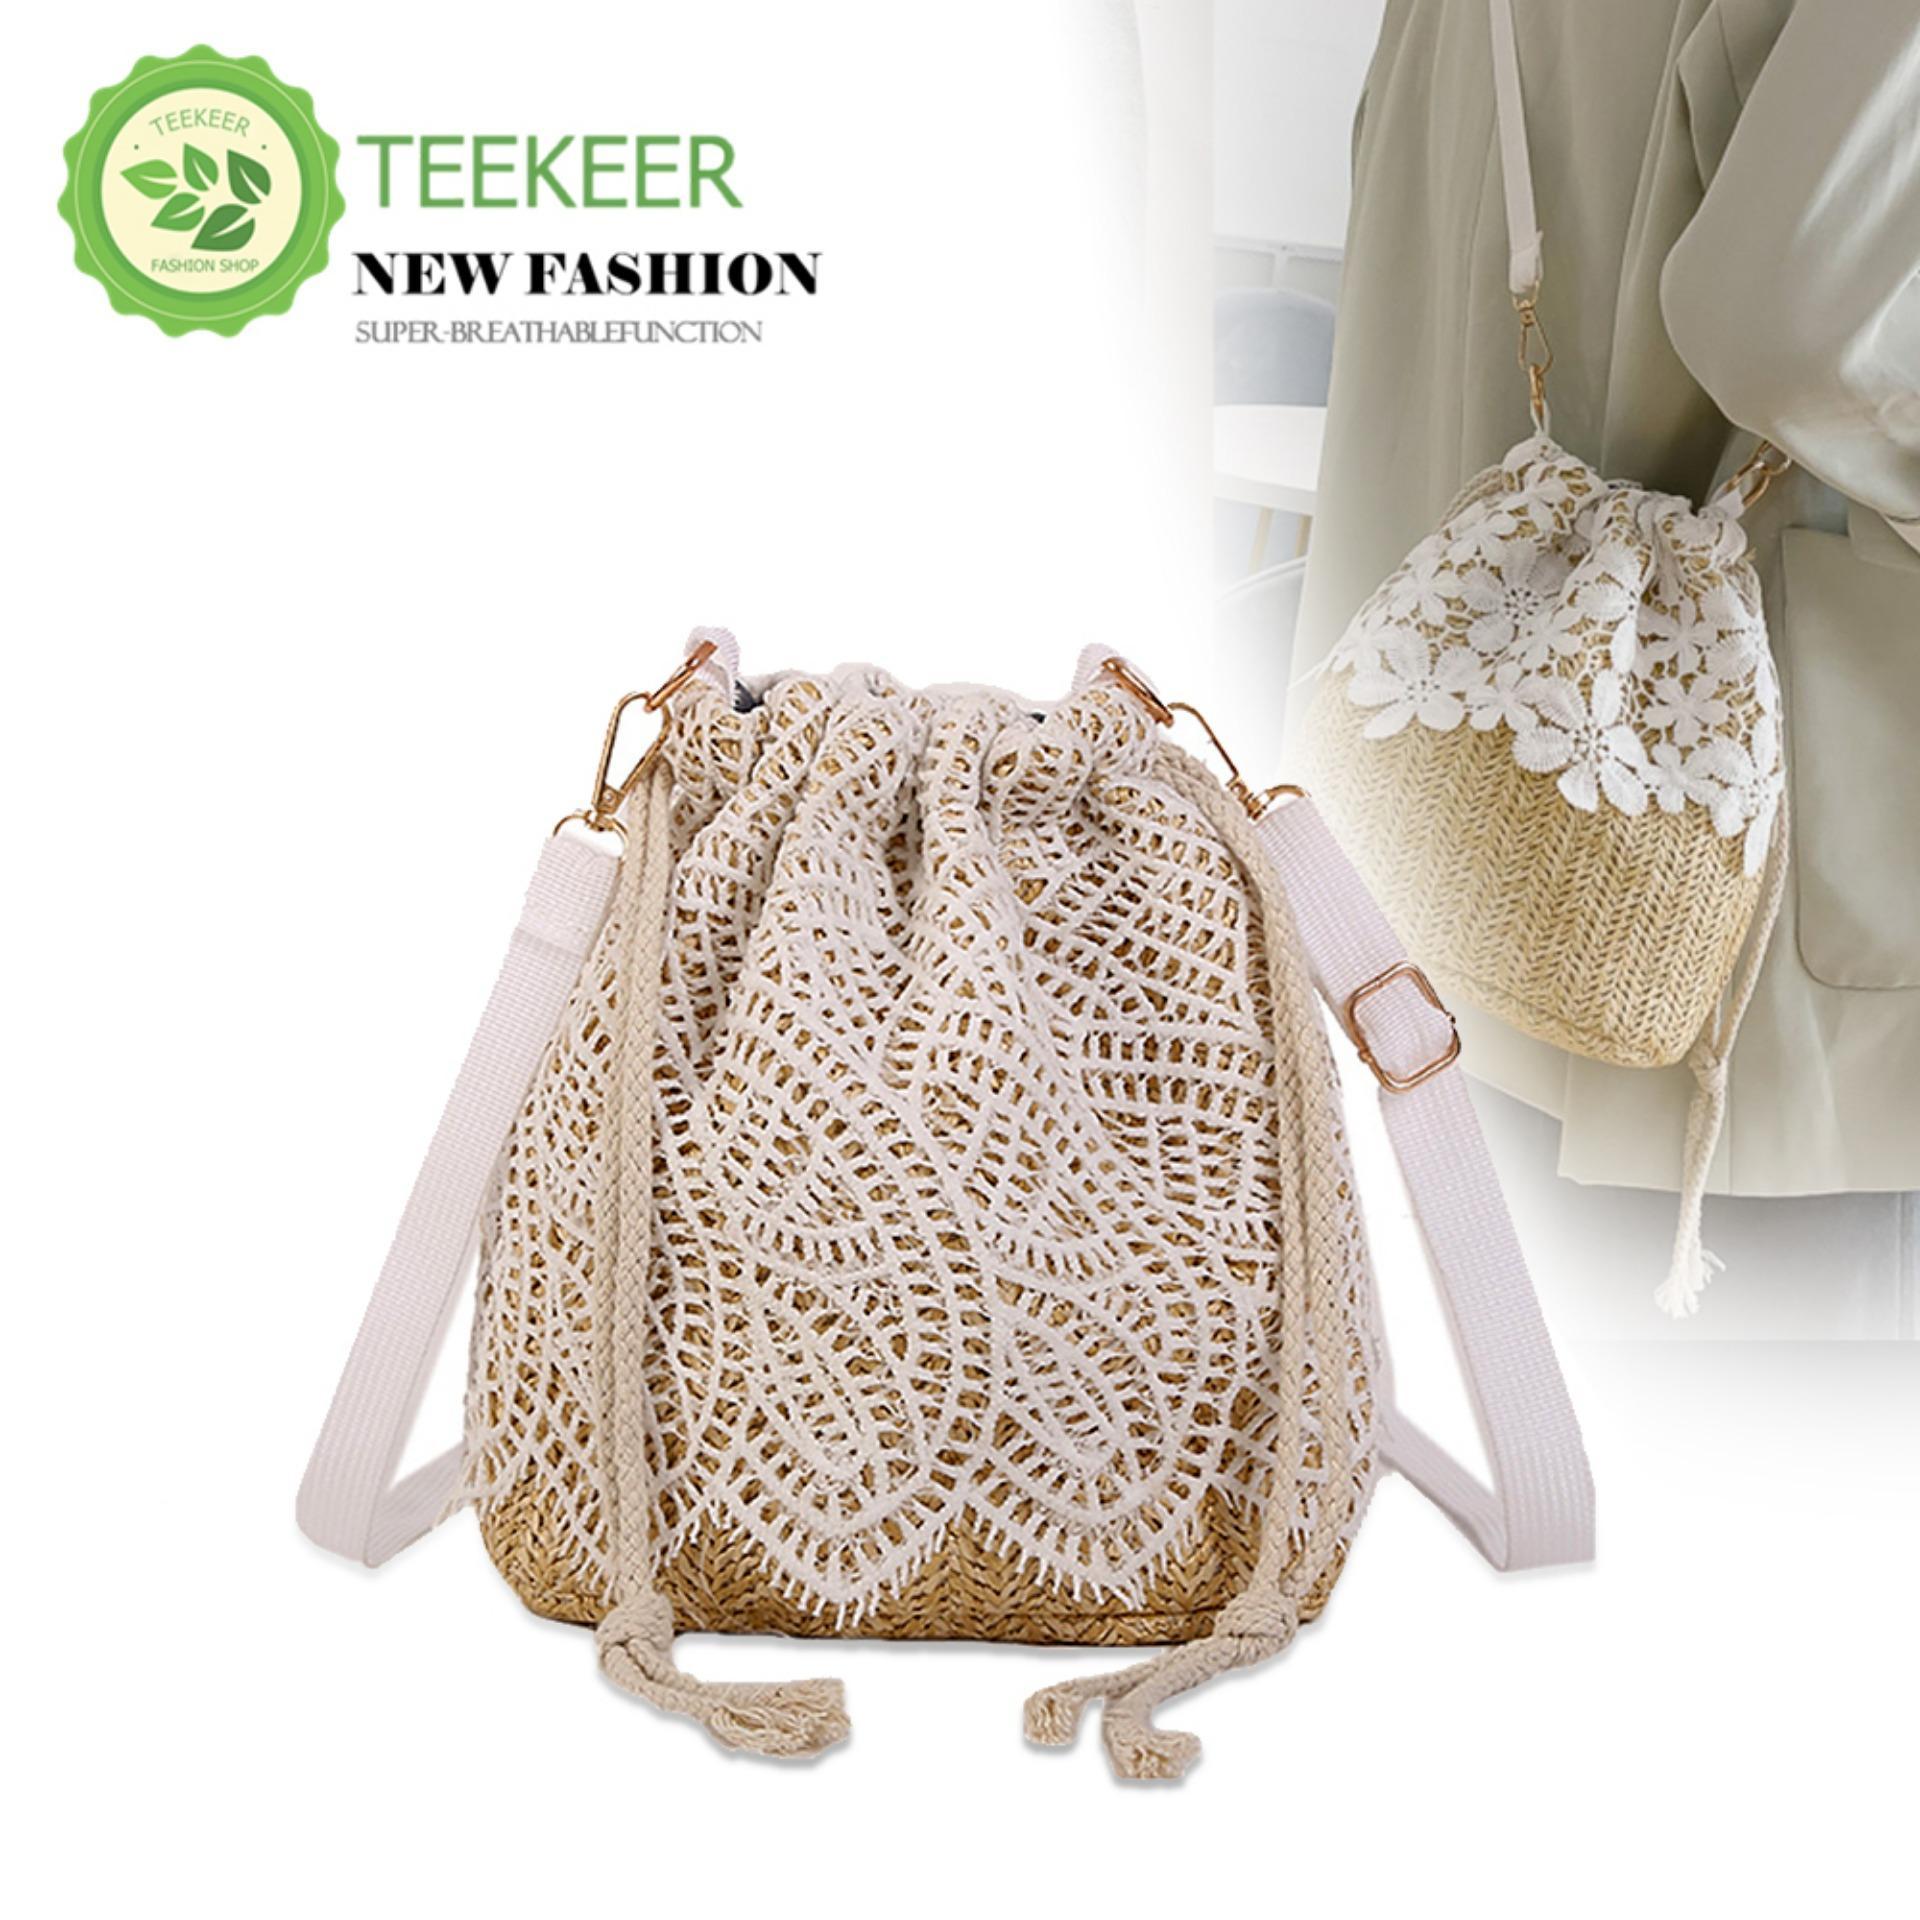 c20cb496d9f8 Latest Teekeer Cross Body & Shoulder Bags Products | Enjoy Huge ...